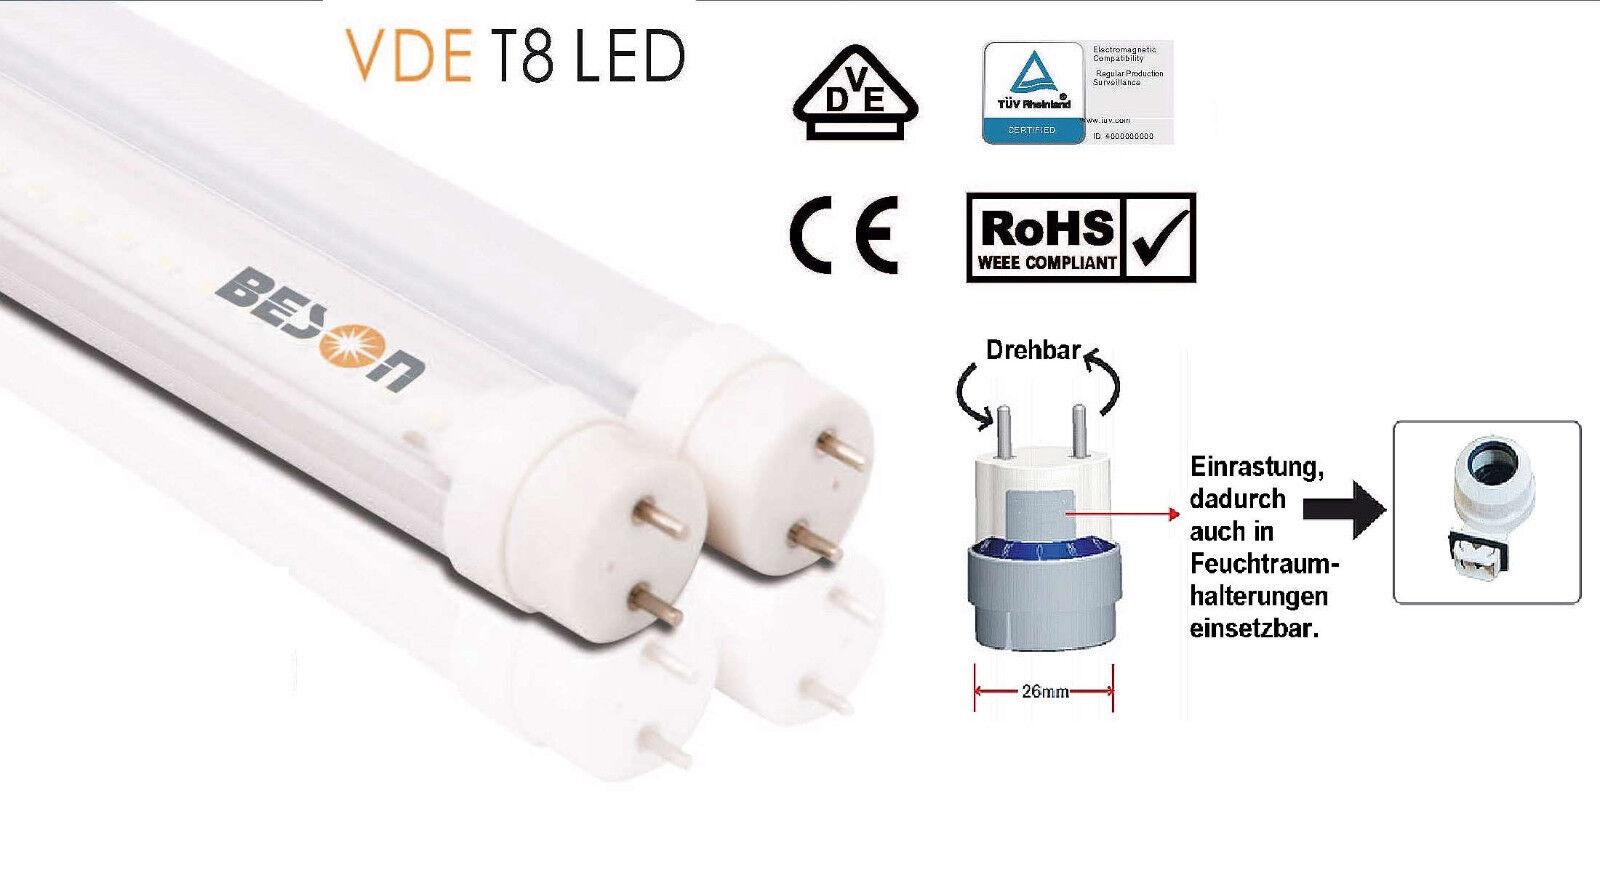 Aubytec ® ultra ultra ultra luminosa TÜV TUBO LED 30w 4800lum 6500k 5j Gar, vn. ordini. 5st.  862ab7